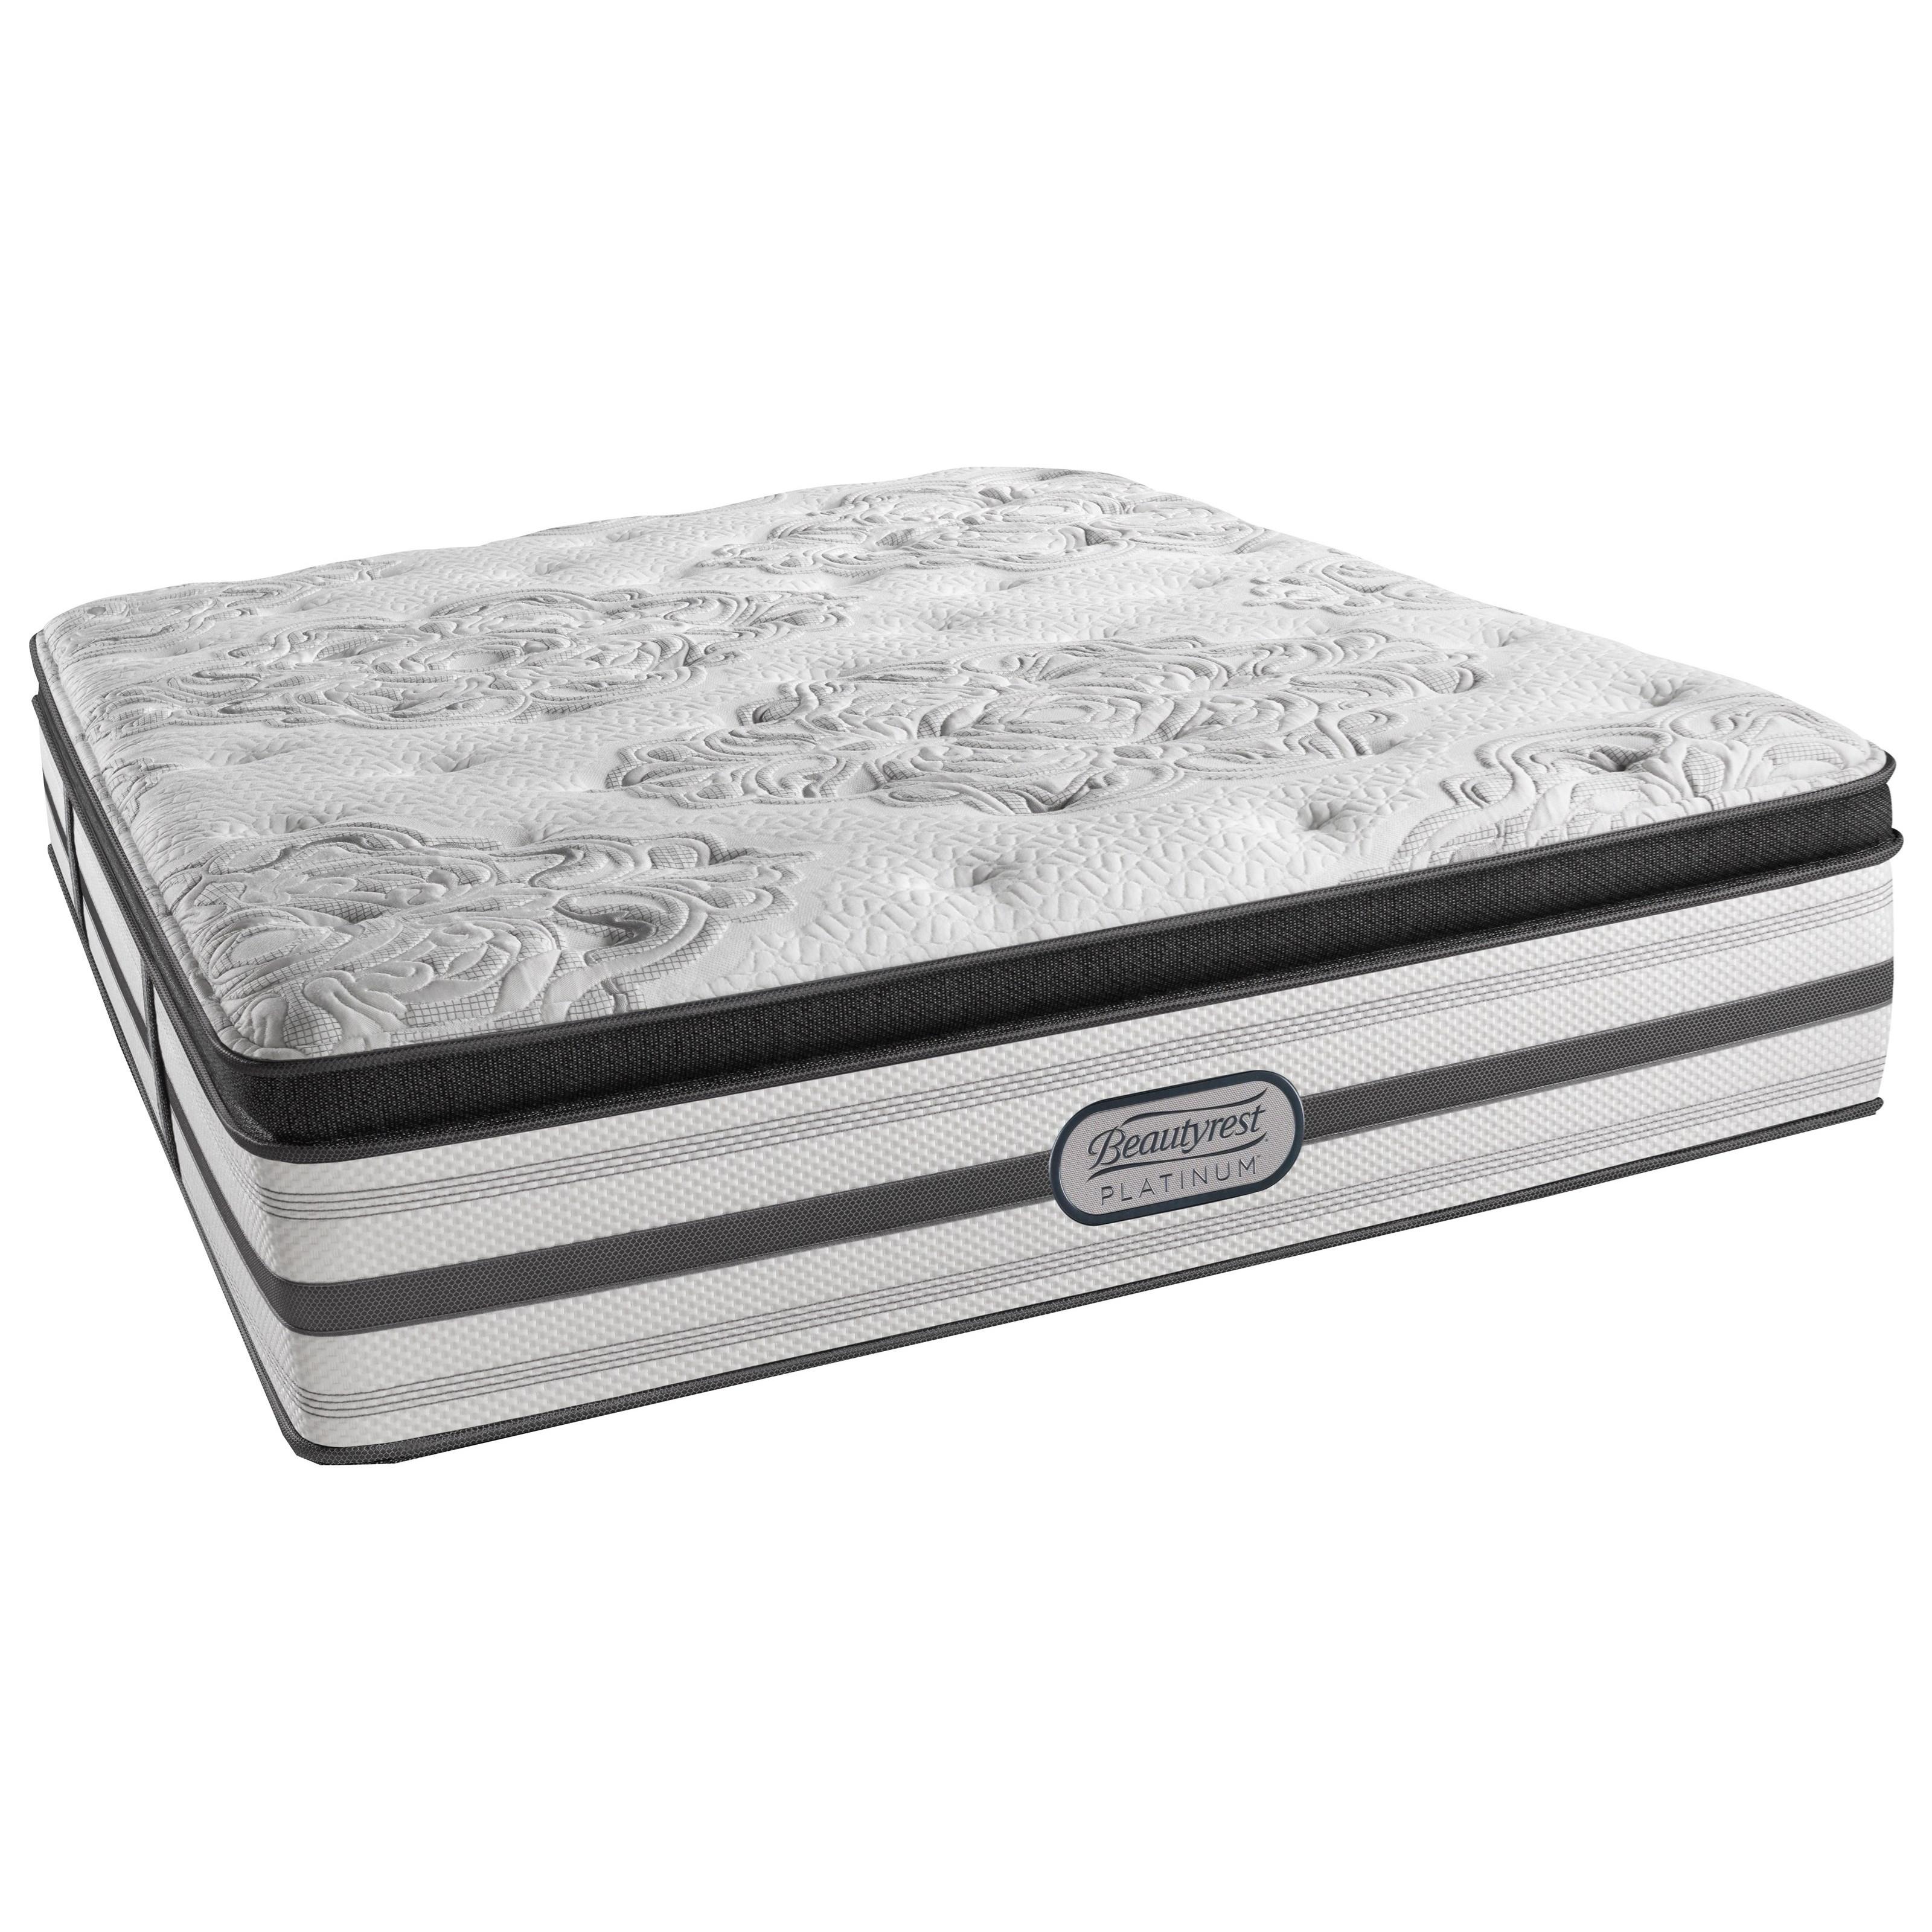 Beautyrest Platinum Gabriella Cal King Plush Pillow Top Adjustable Set - Item Number: LV3PLPT-CK+2xSM2-SPCK